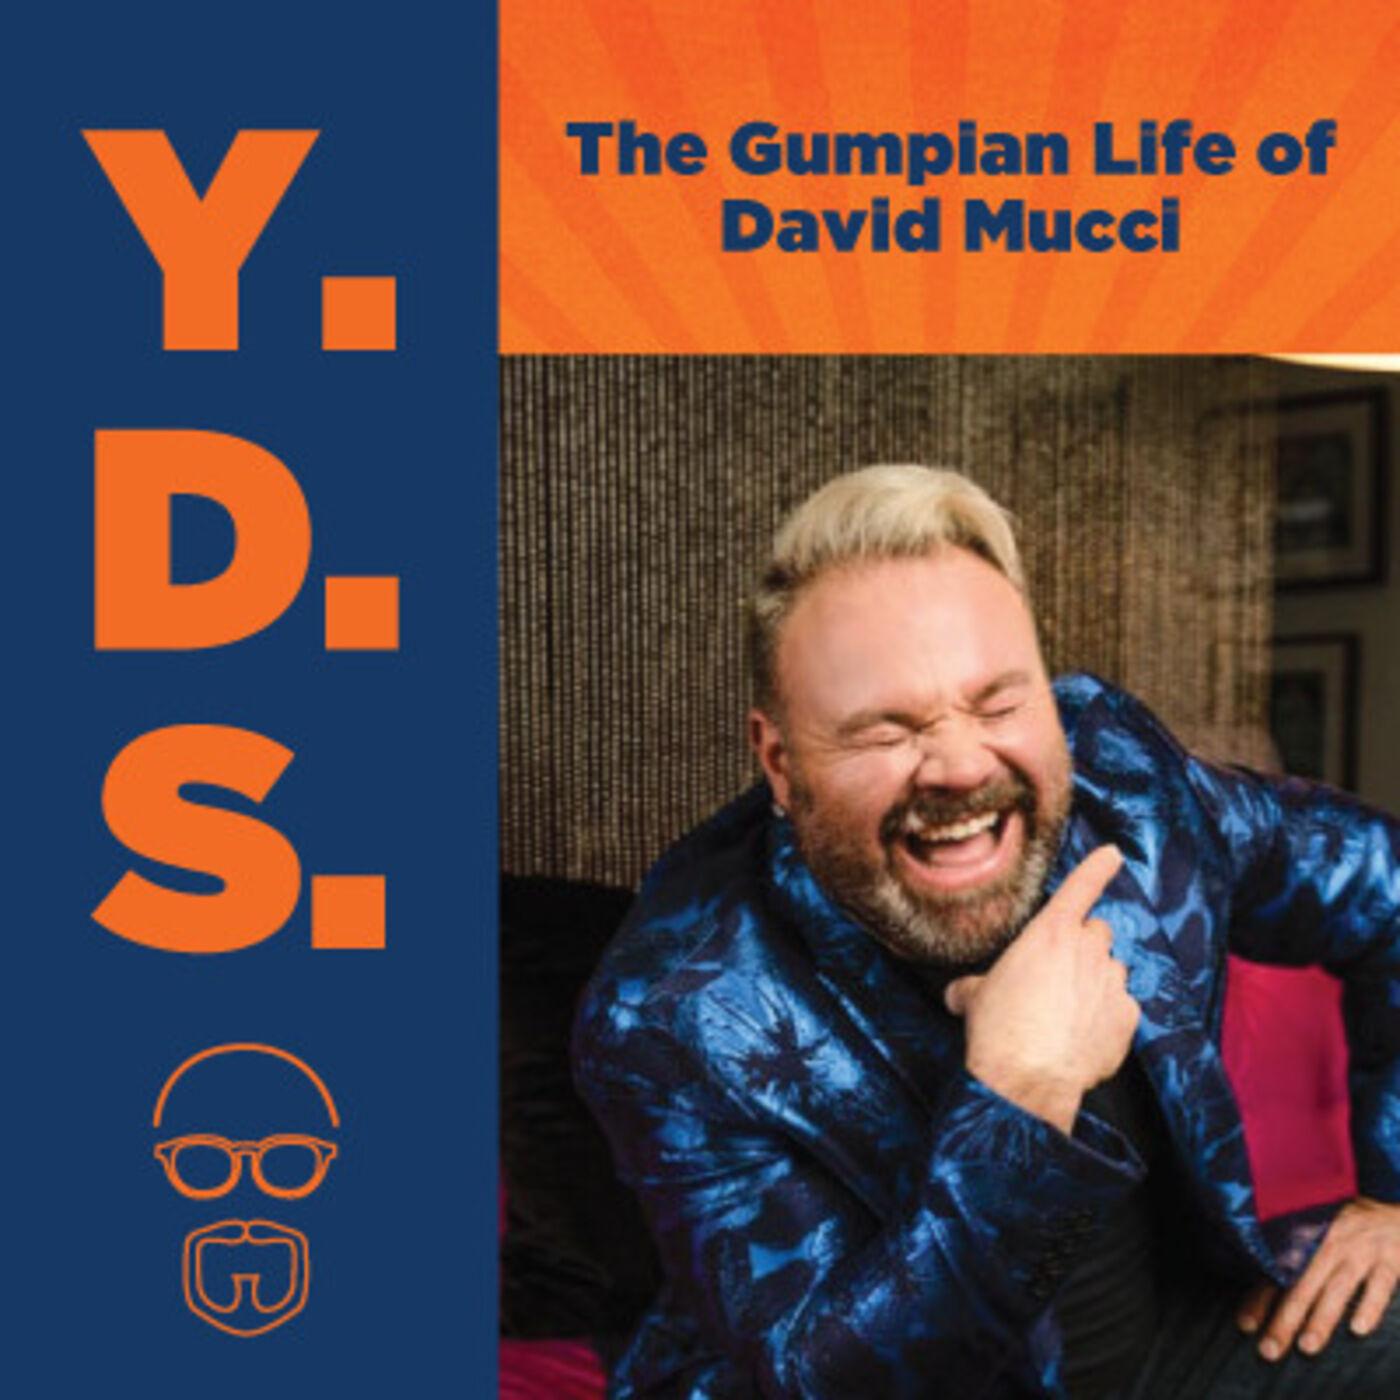 Ep. 18 – The Gumpian Life of David Mucci